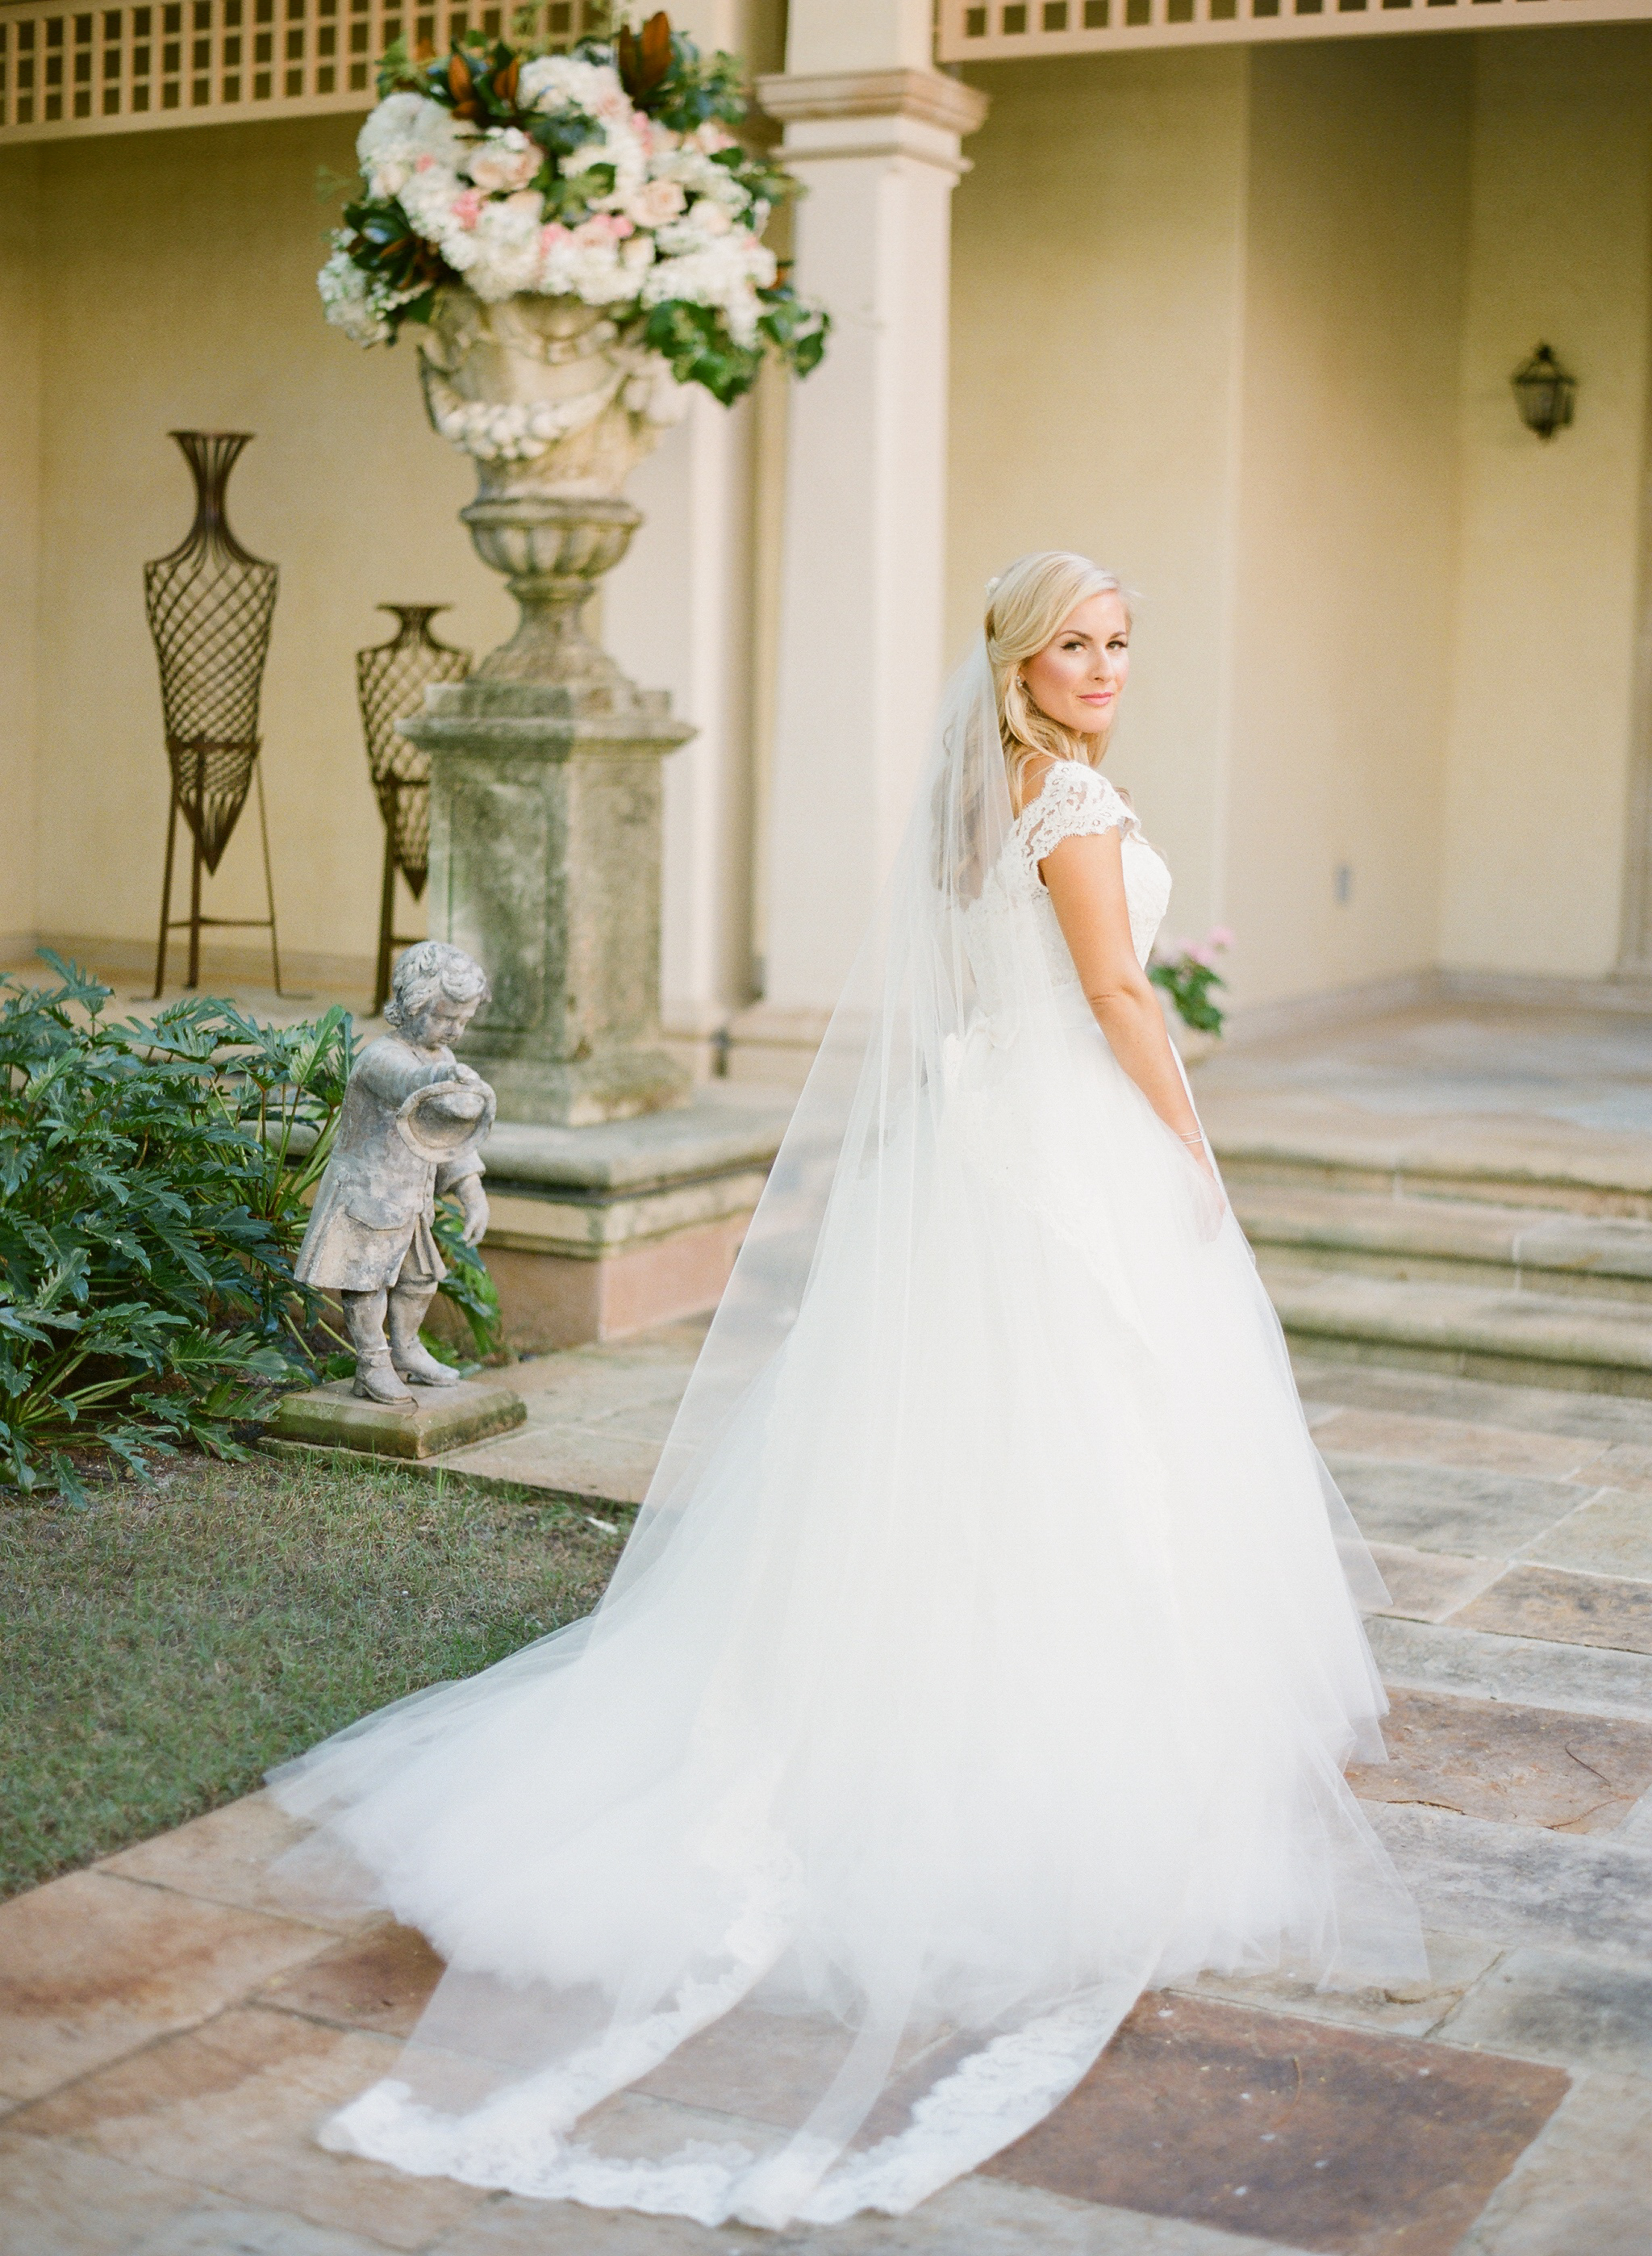 Ceci_New_York_Florida_Wedding_Style_Bride_Watercolor_Real_Custom_Luxury_20.jpg